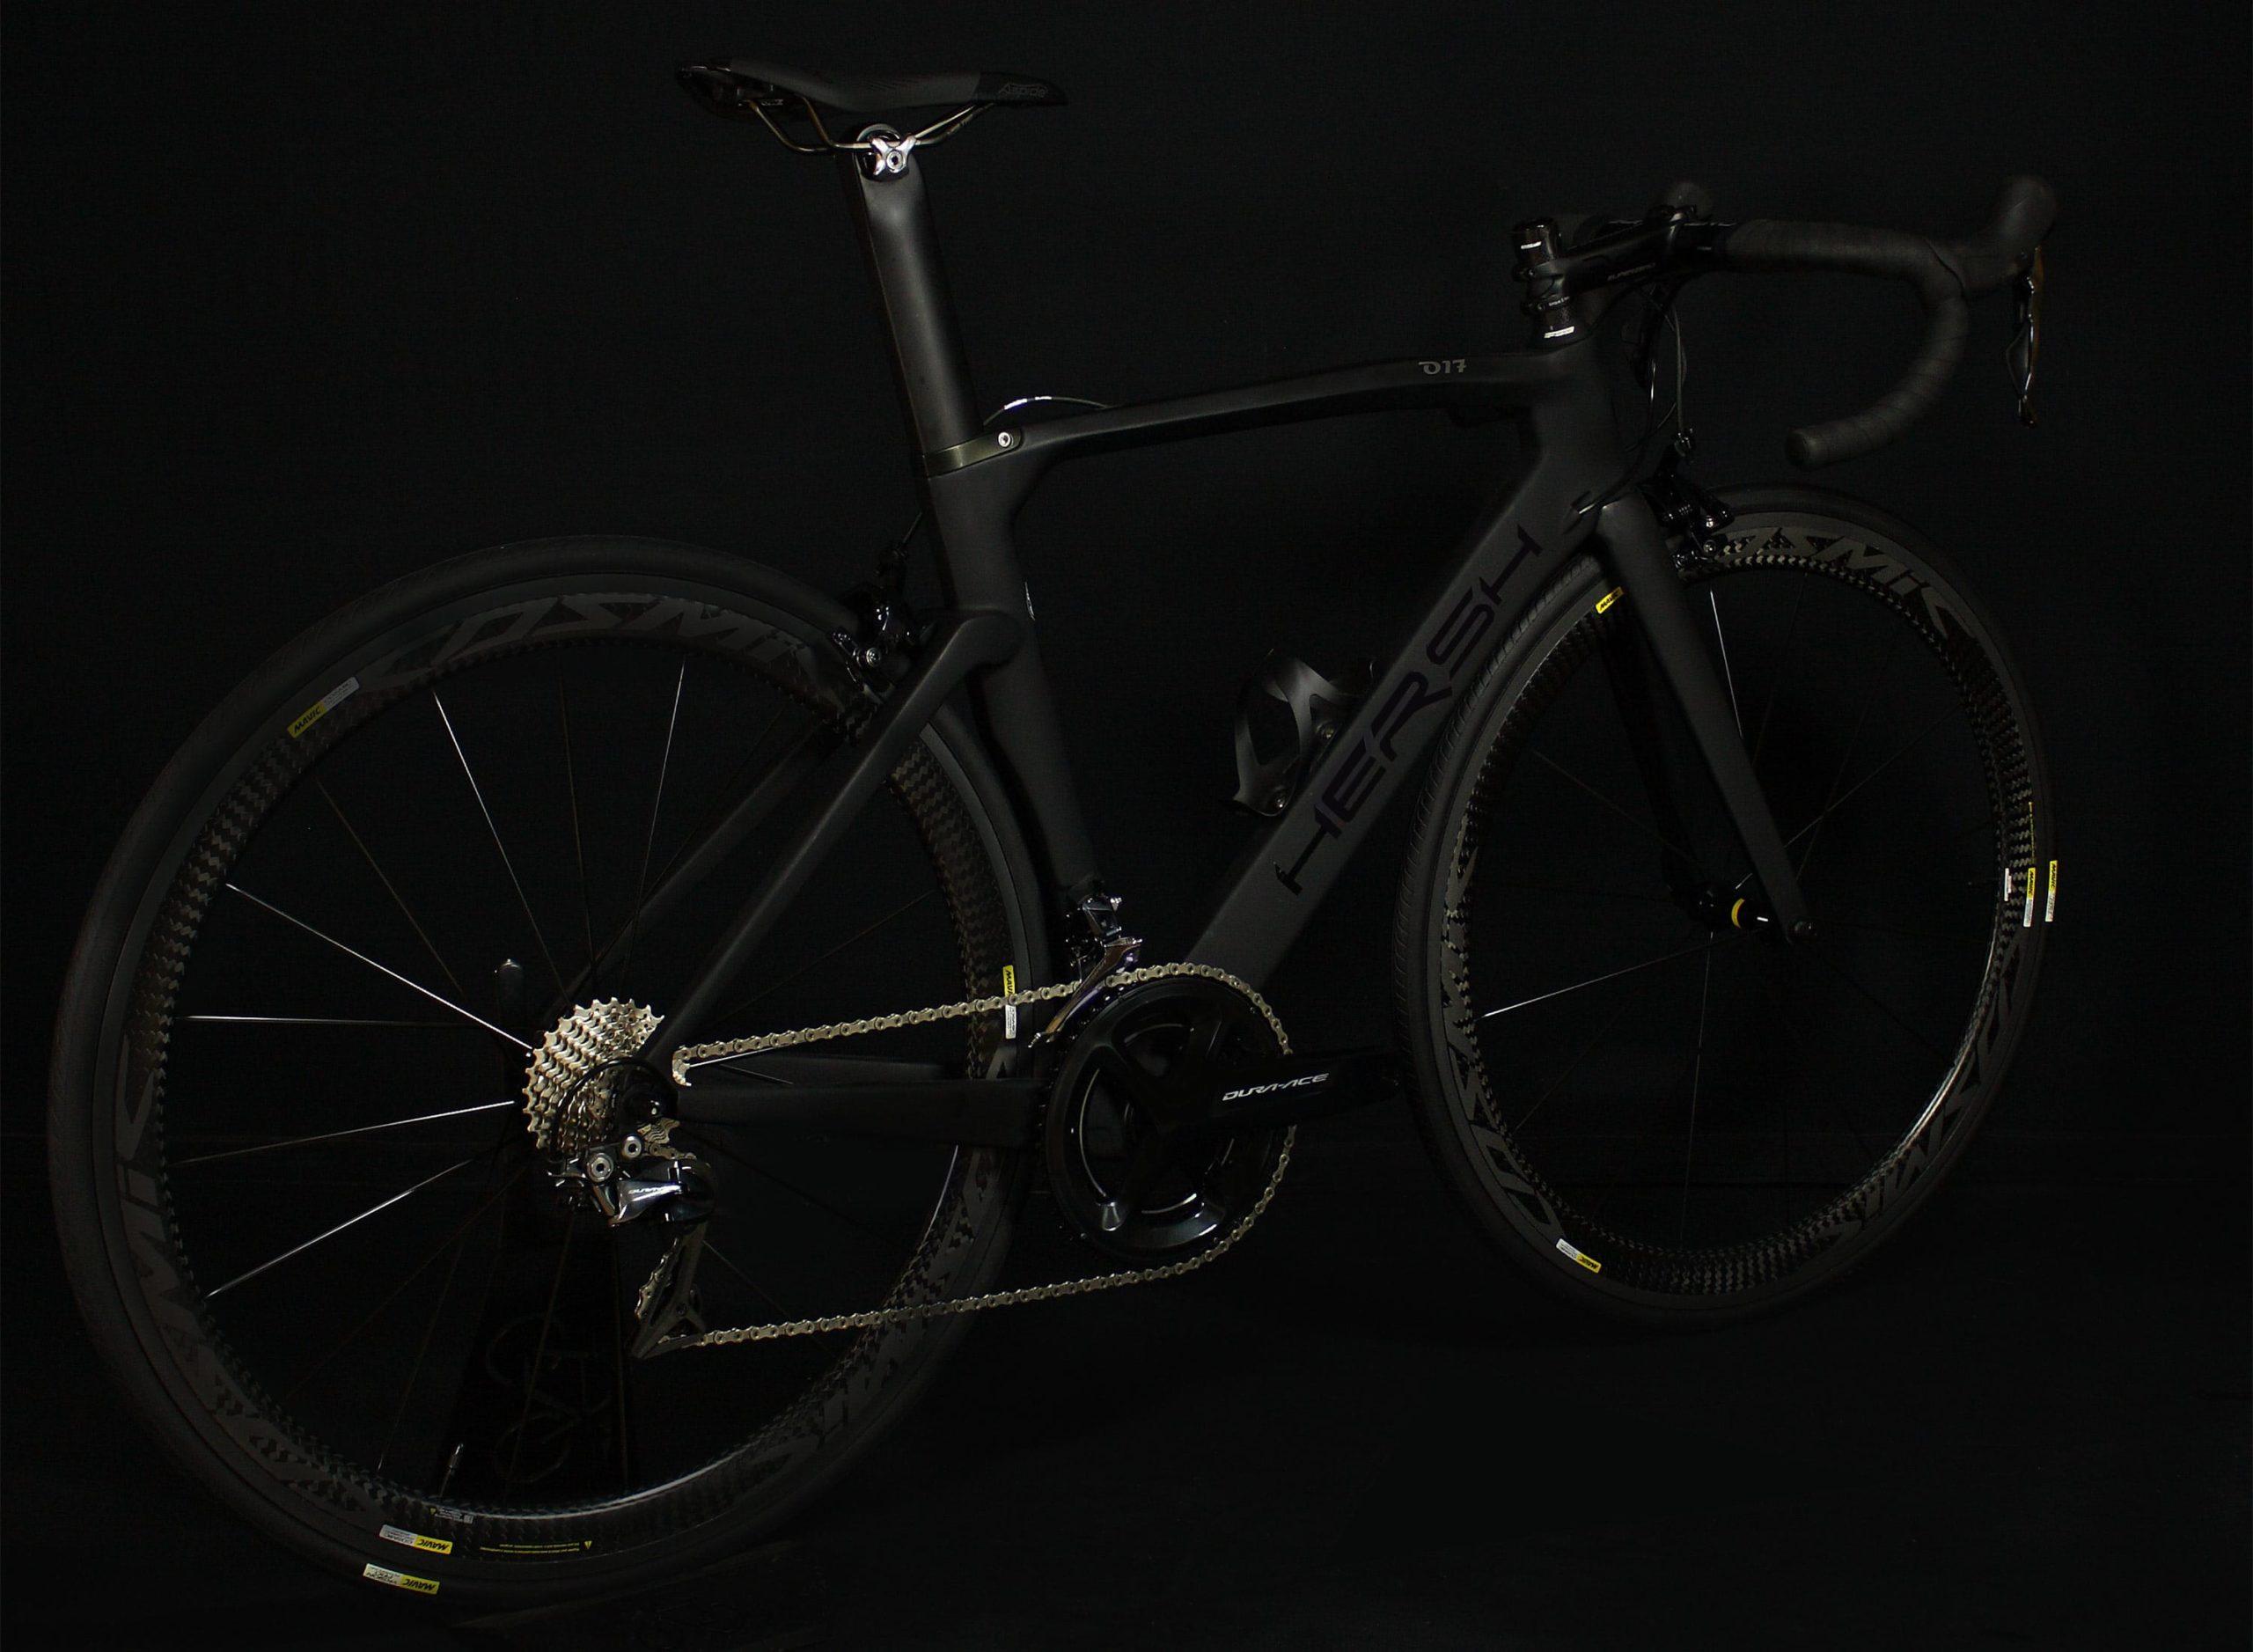 Hersh R911 road bike total black